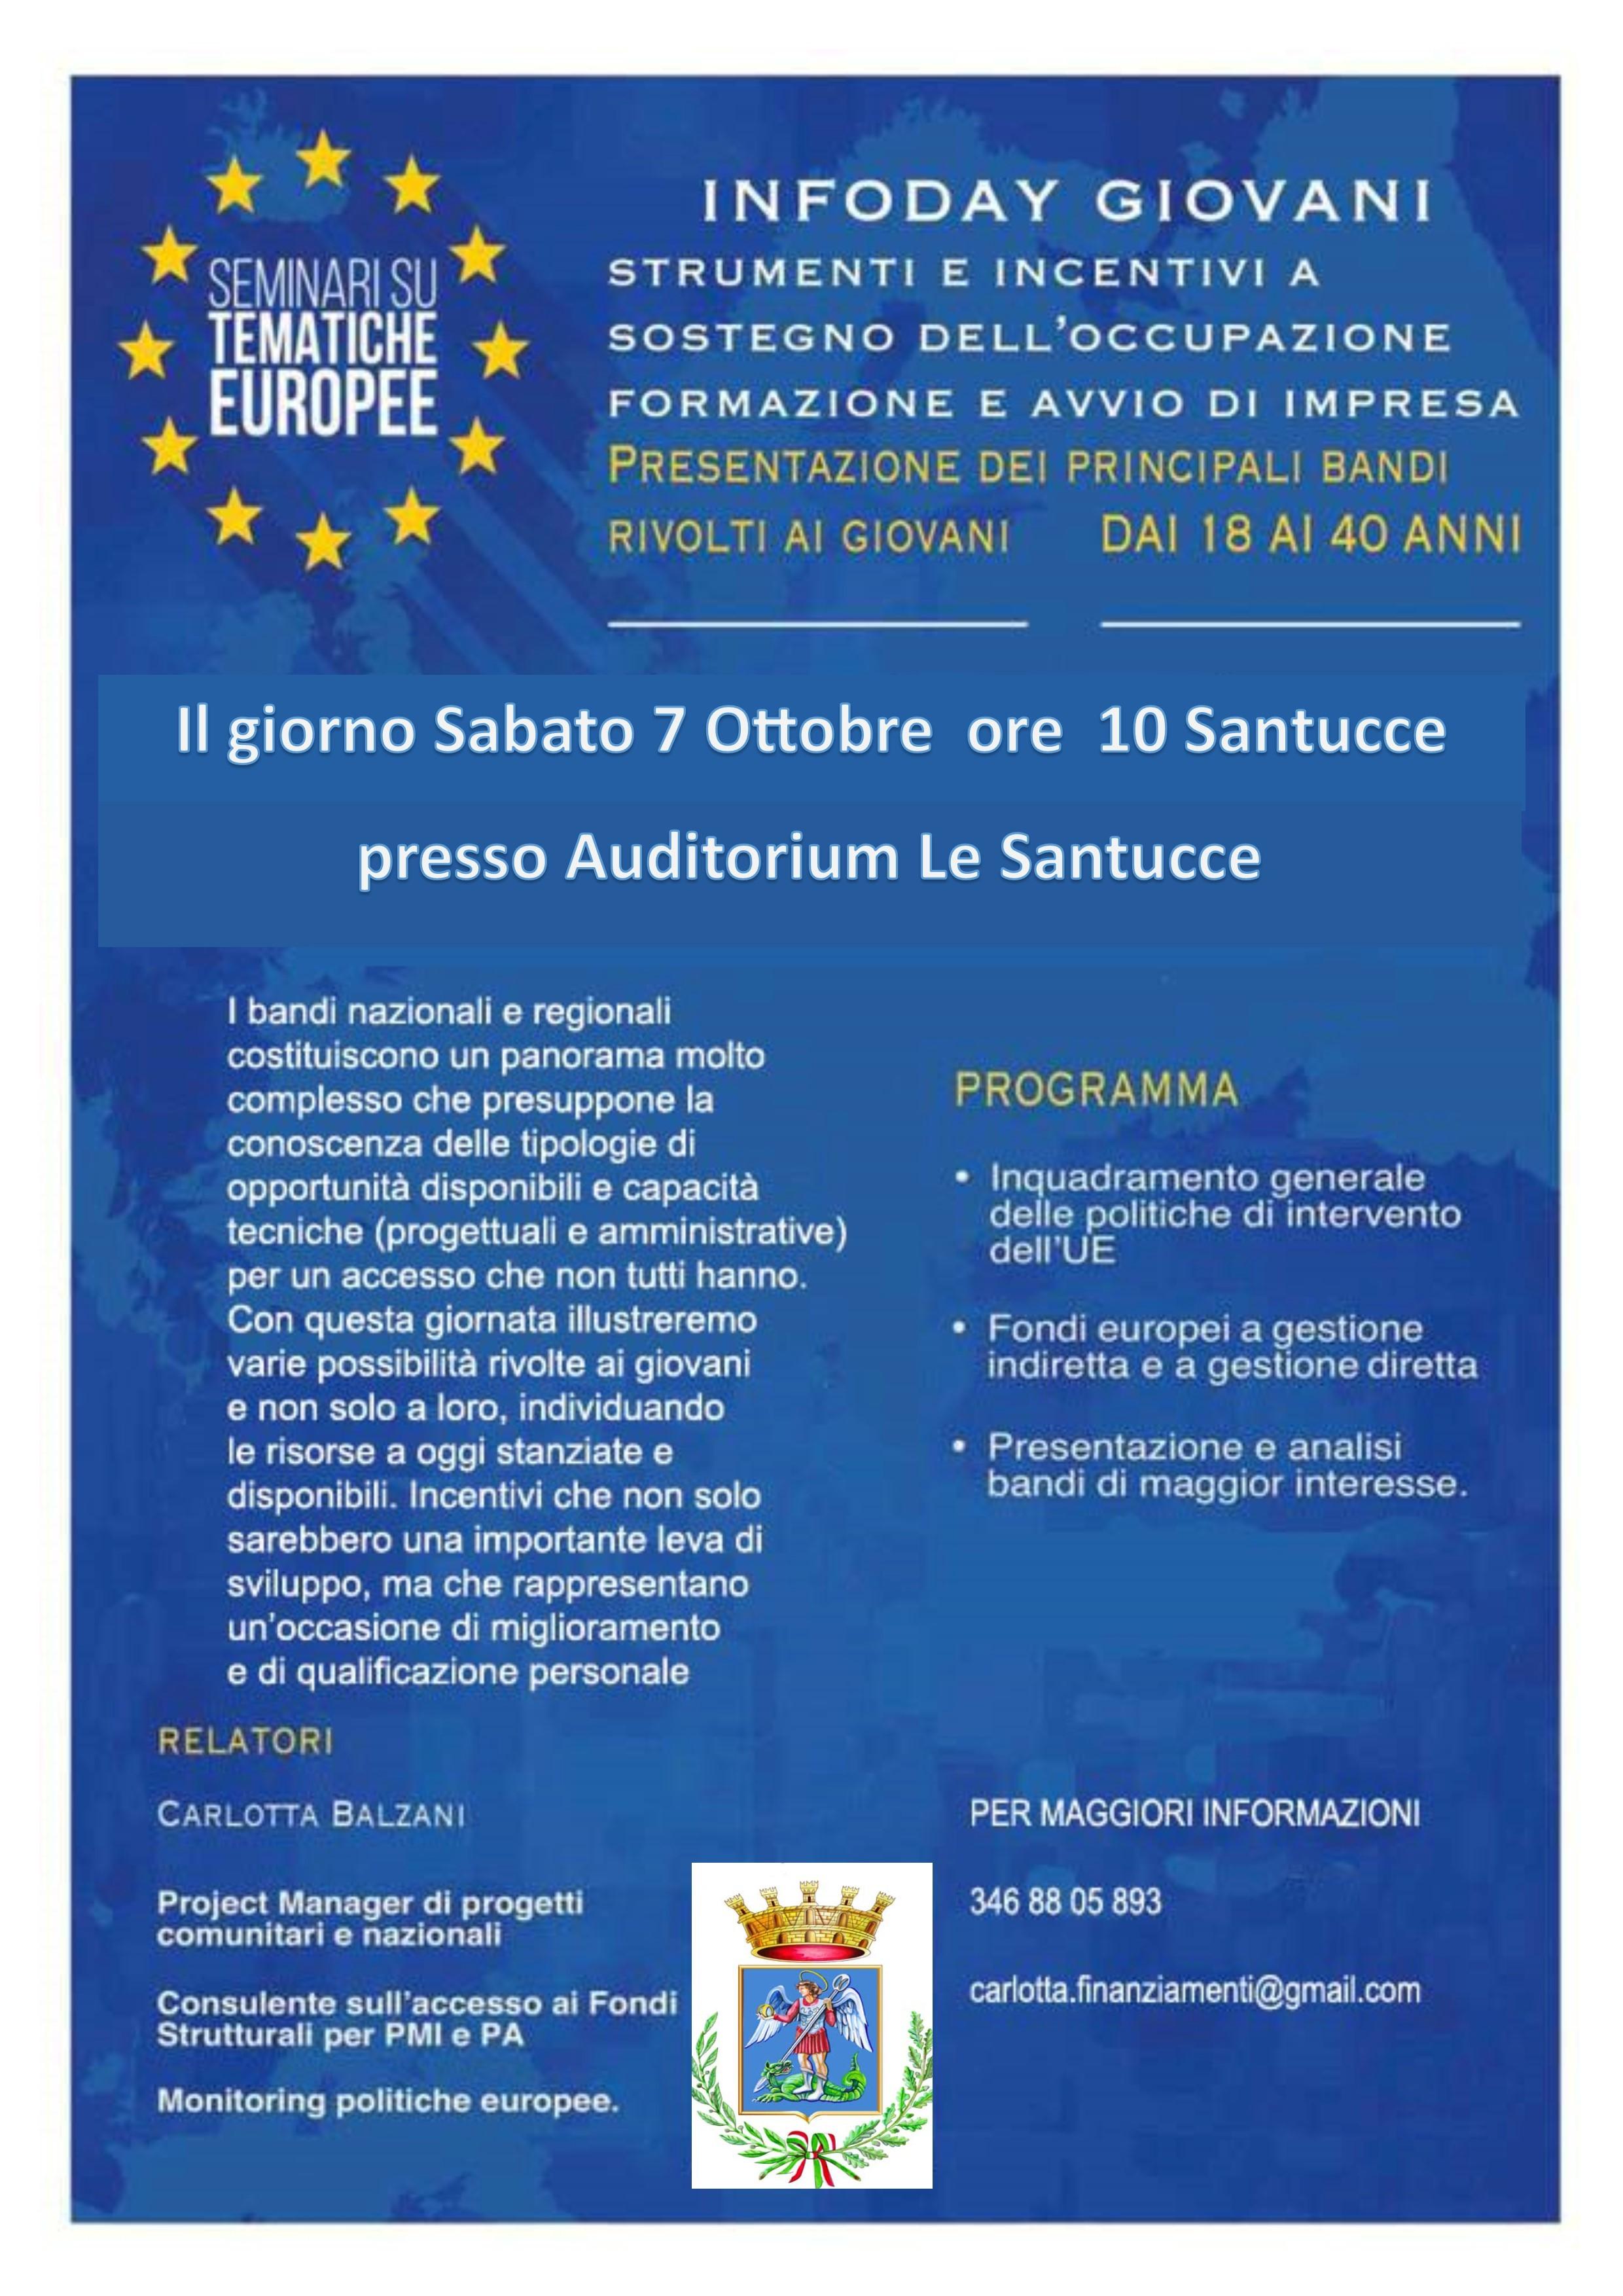 InfoDay Giovani all'auditorium Le Santucce